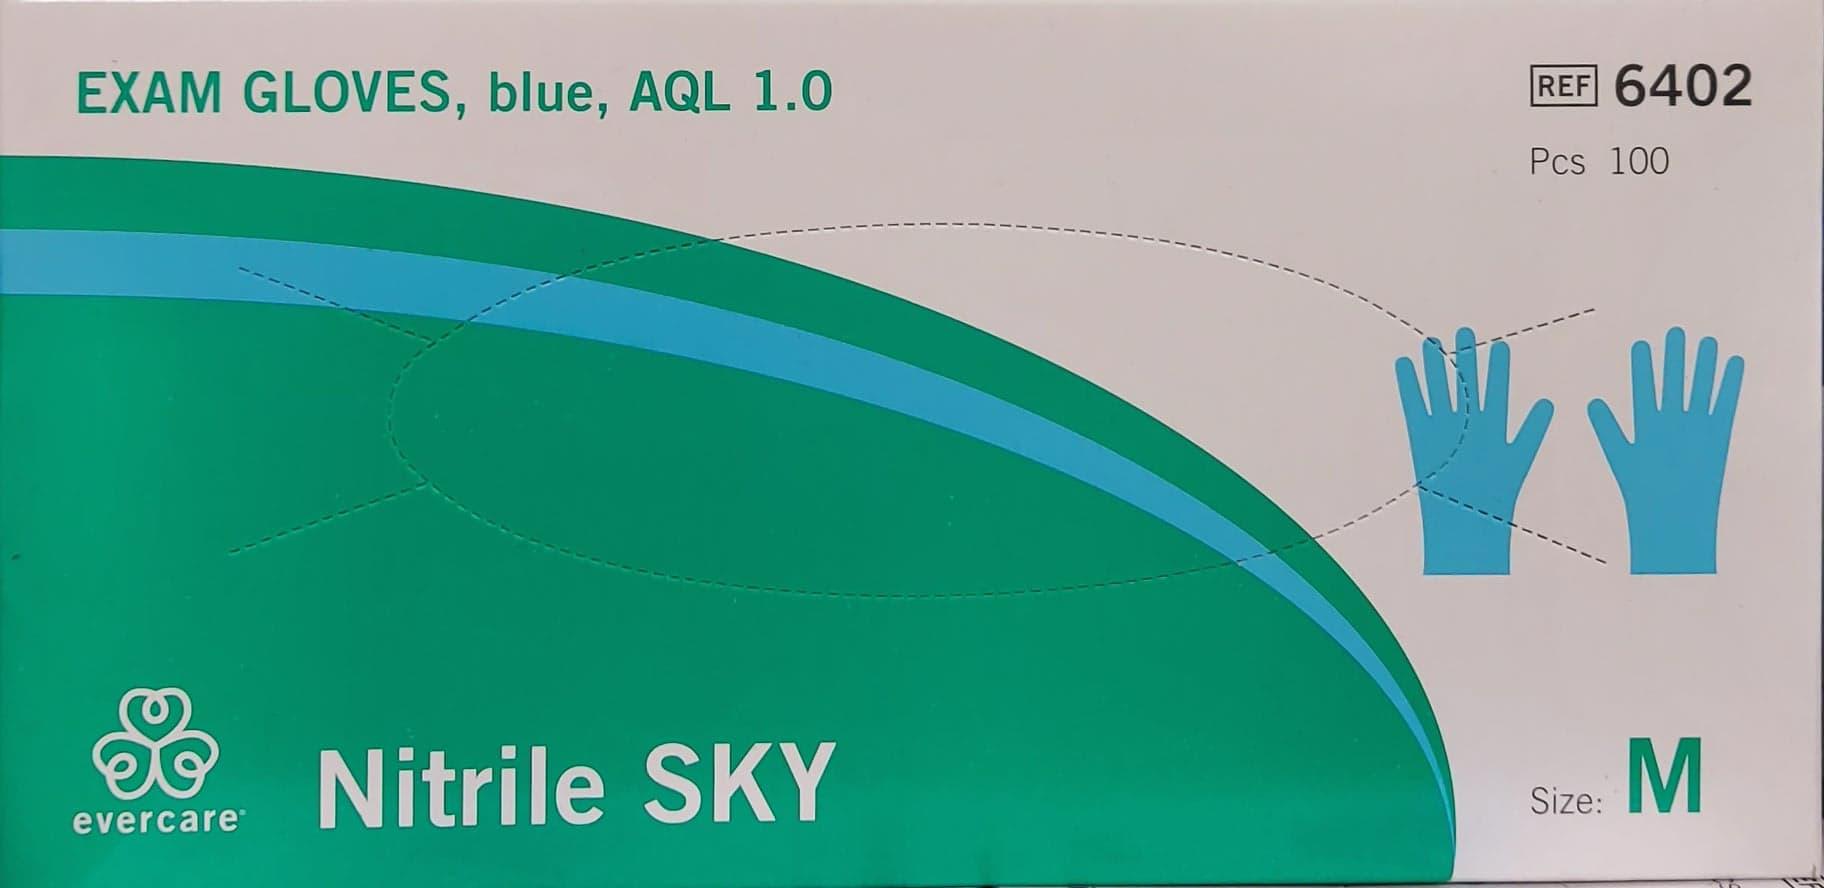 Nitriilikumikäsine, kertakäyttöinen 100 kpl, koko S,M, L Image